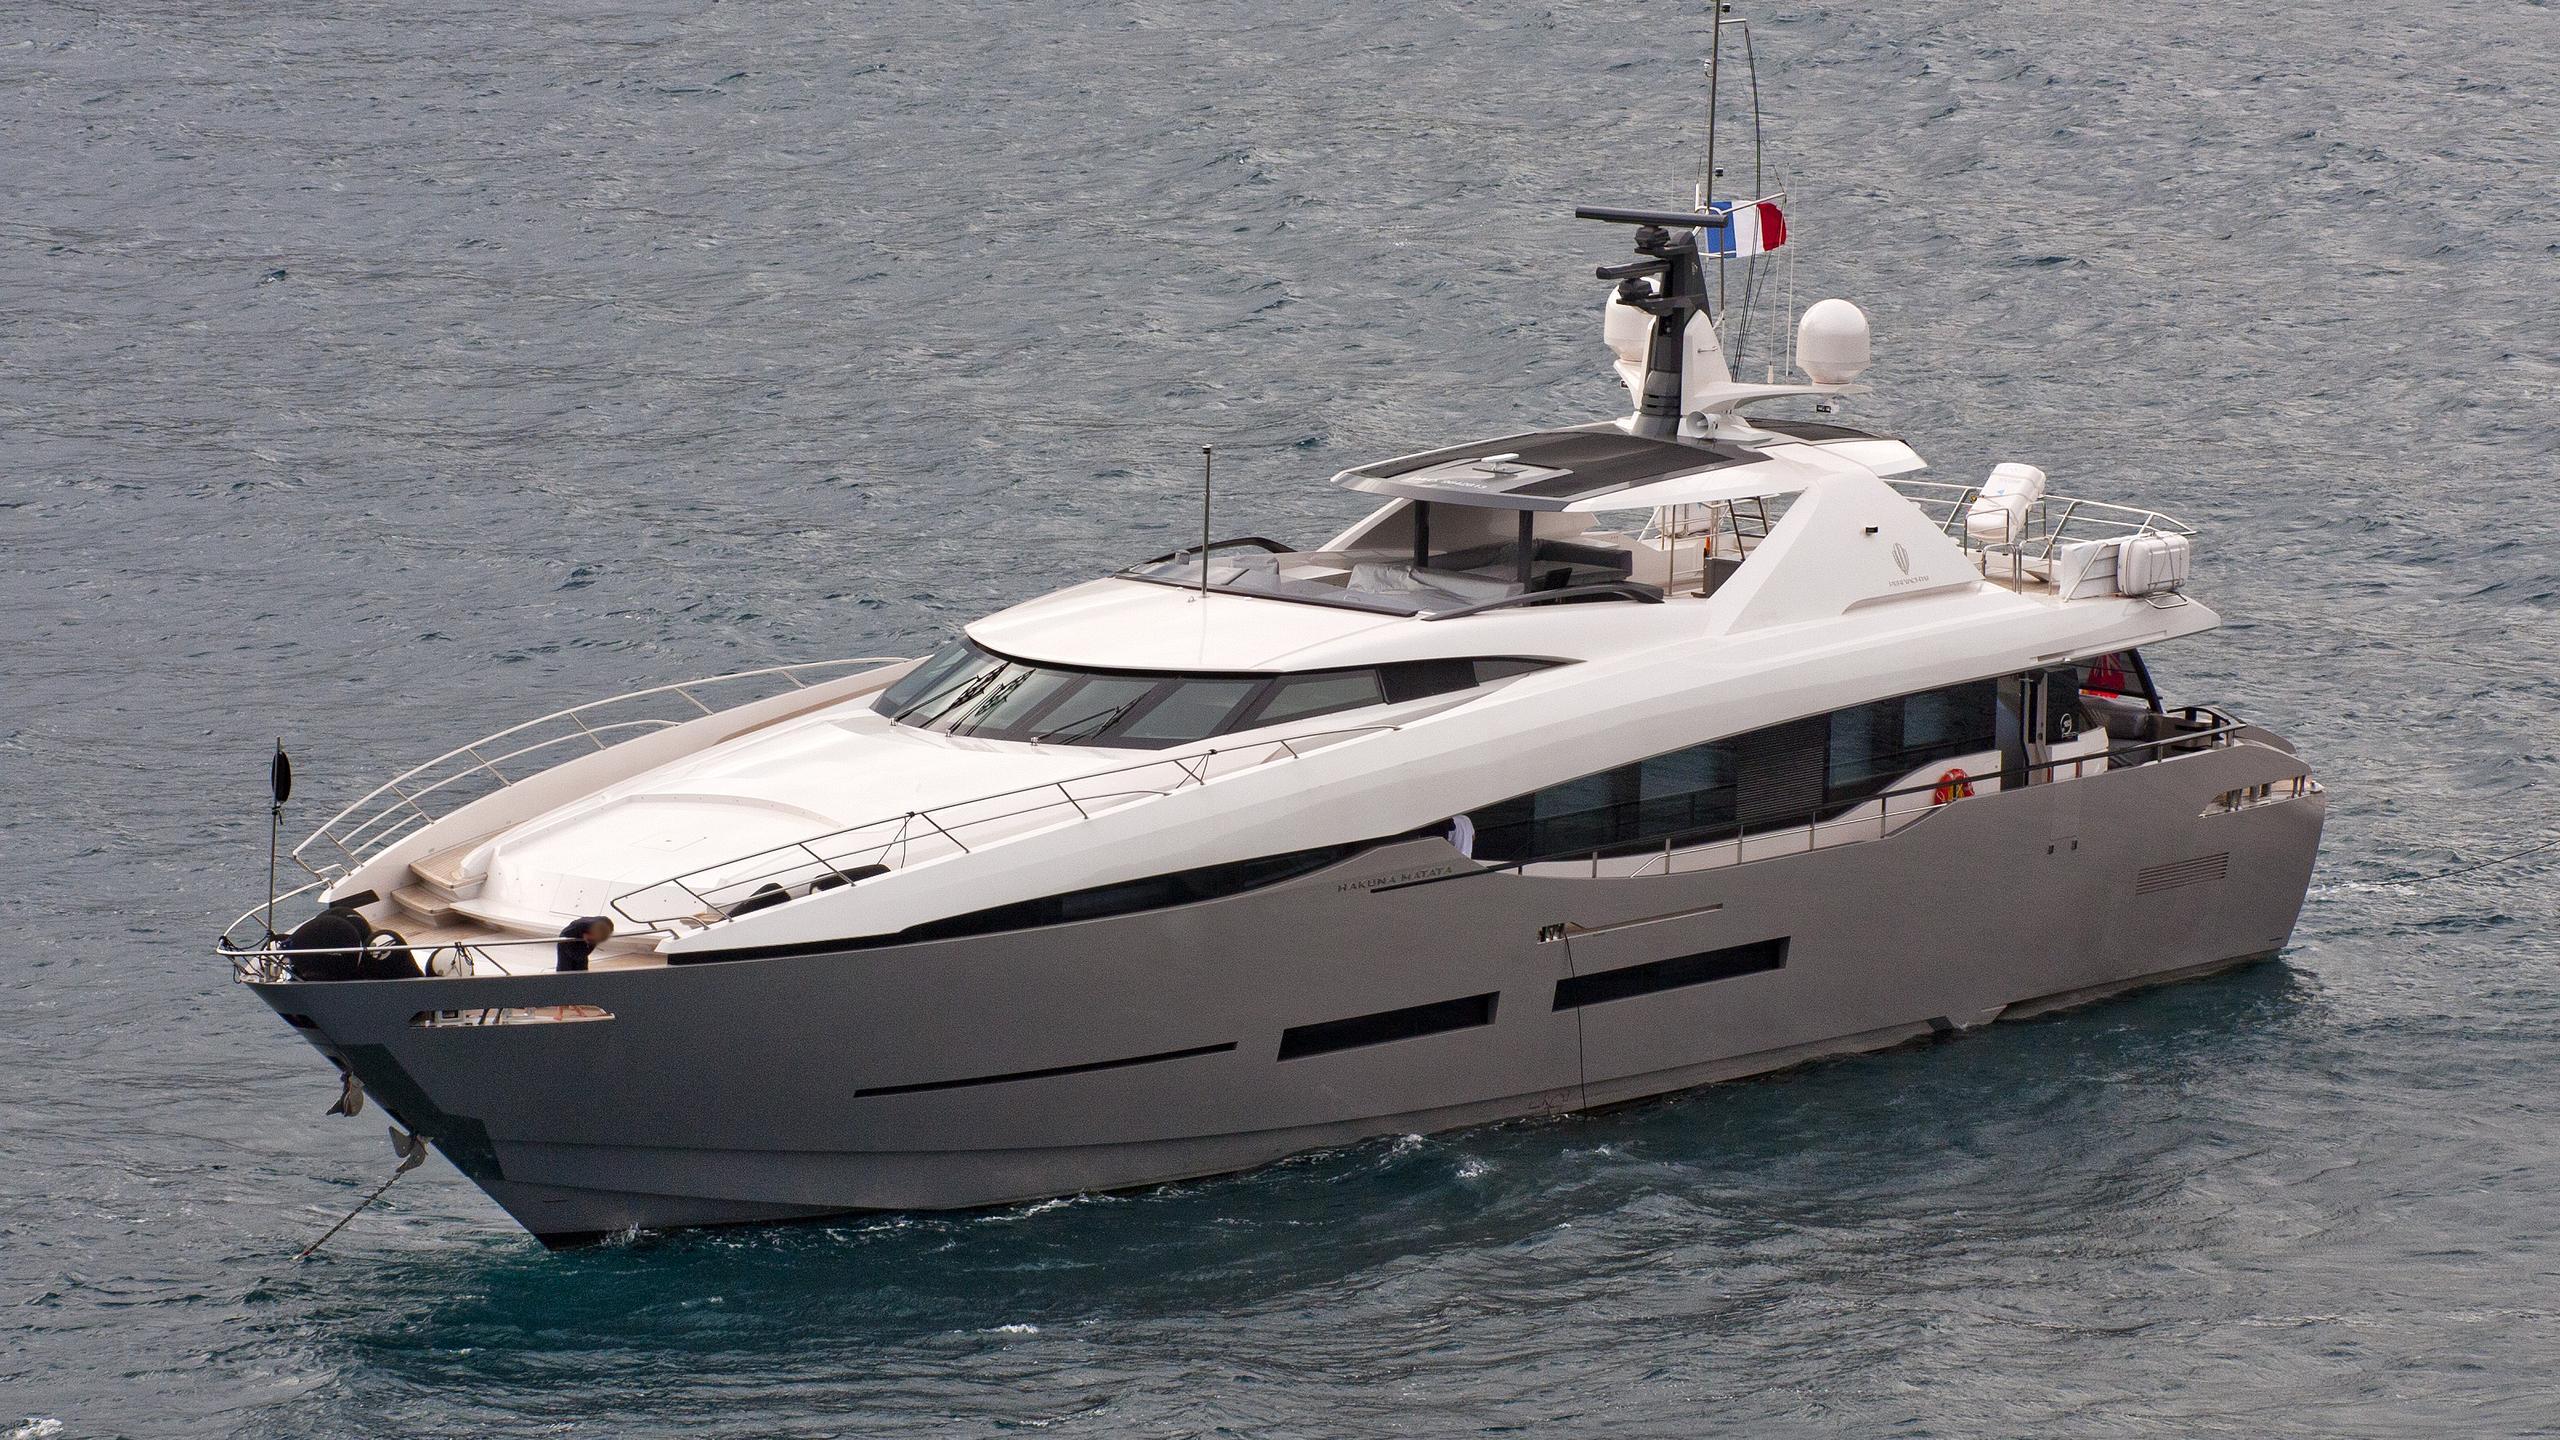 hakuna-matata-motoryacht-peri-yachts-2011-38m-half-profile